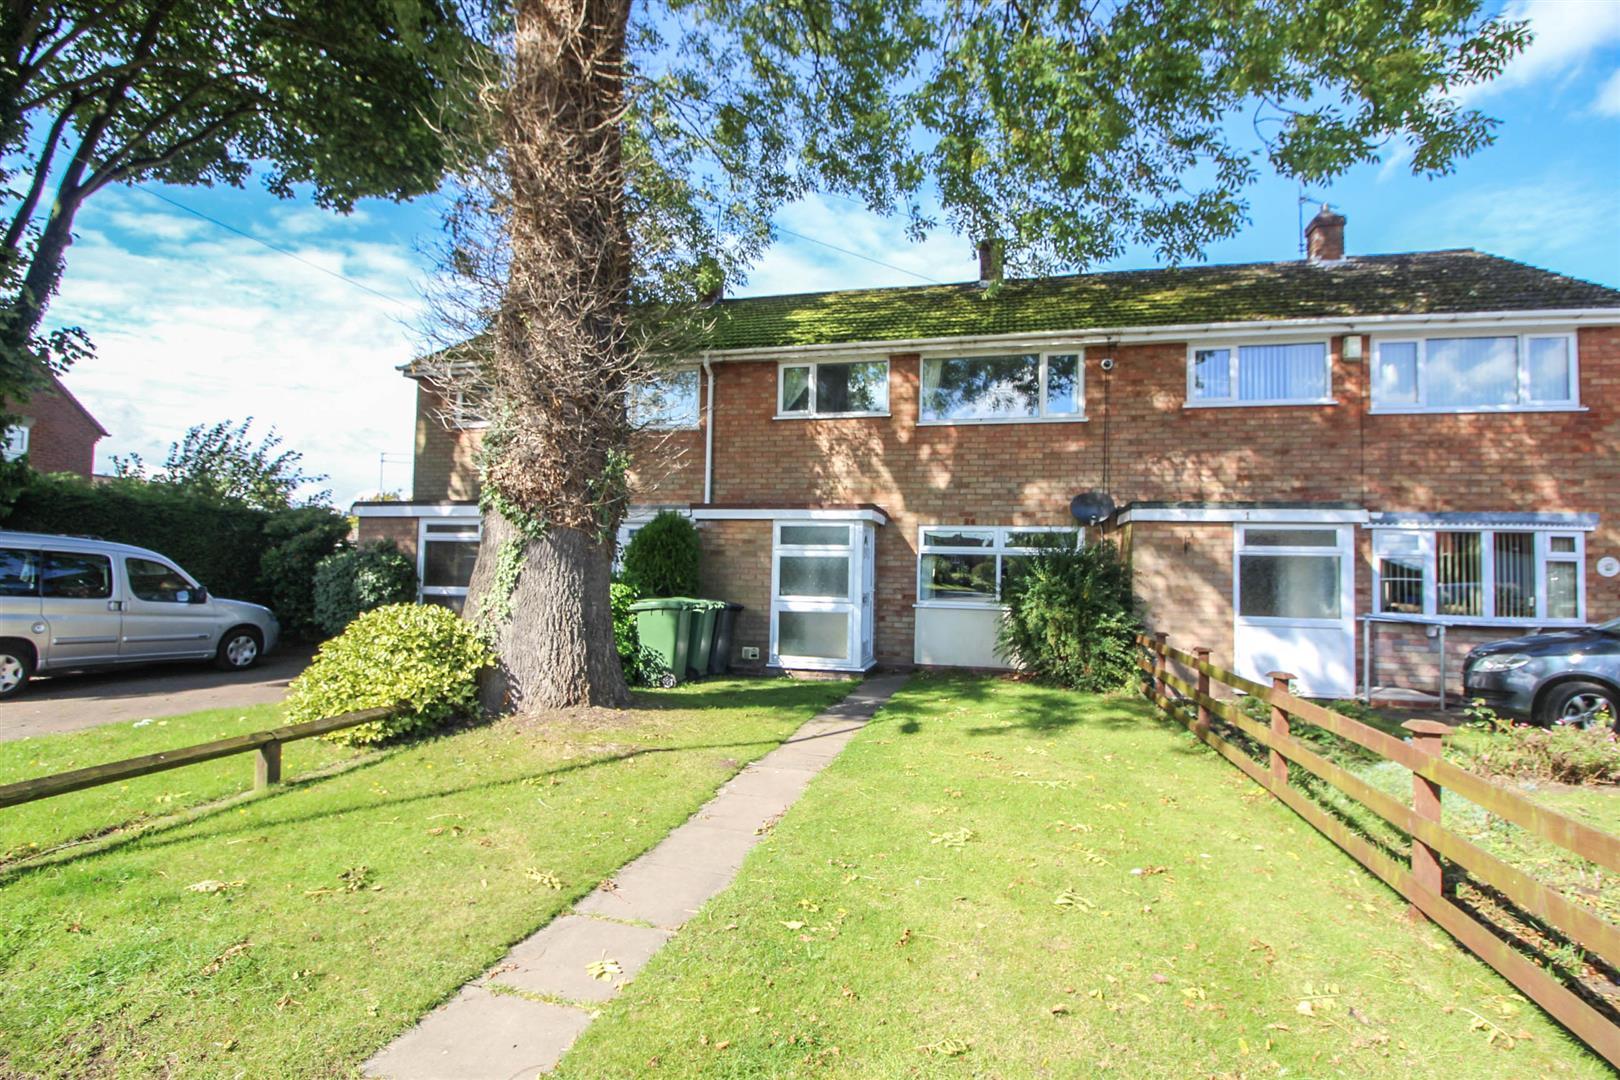 3 Bedrooms Terraced House for sale in Heathfield Road, Redditch